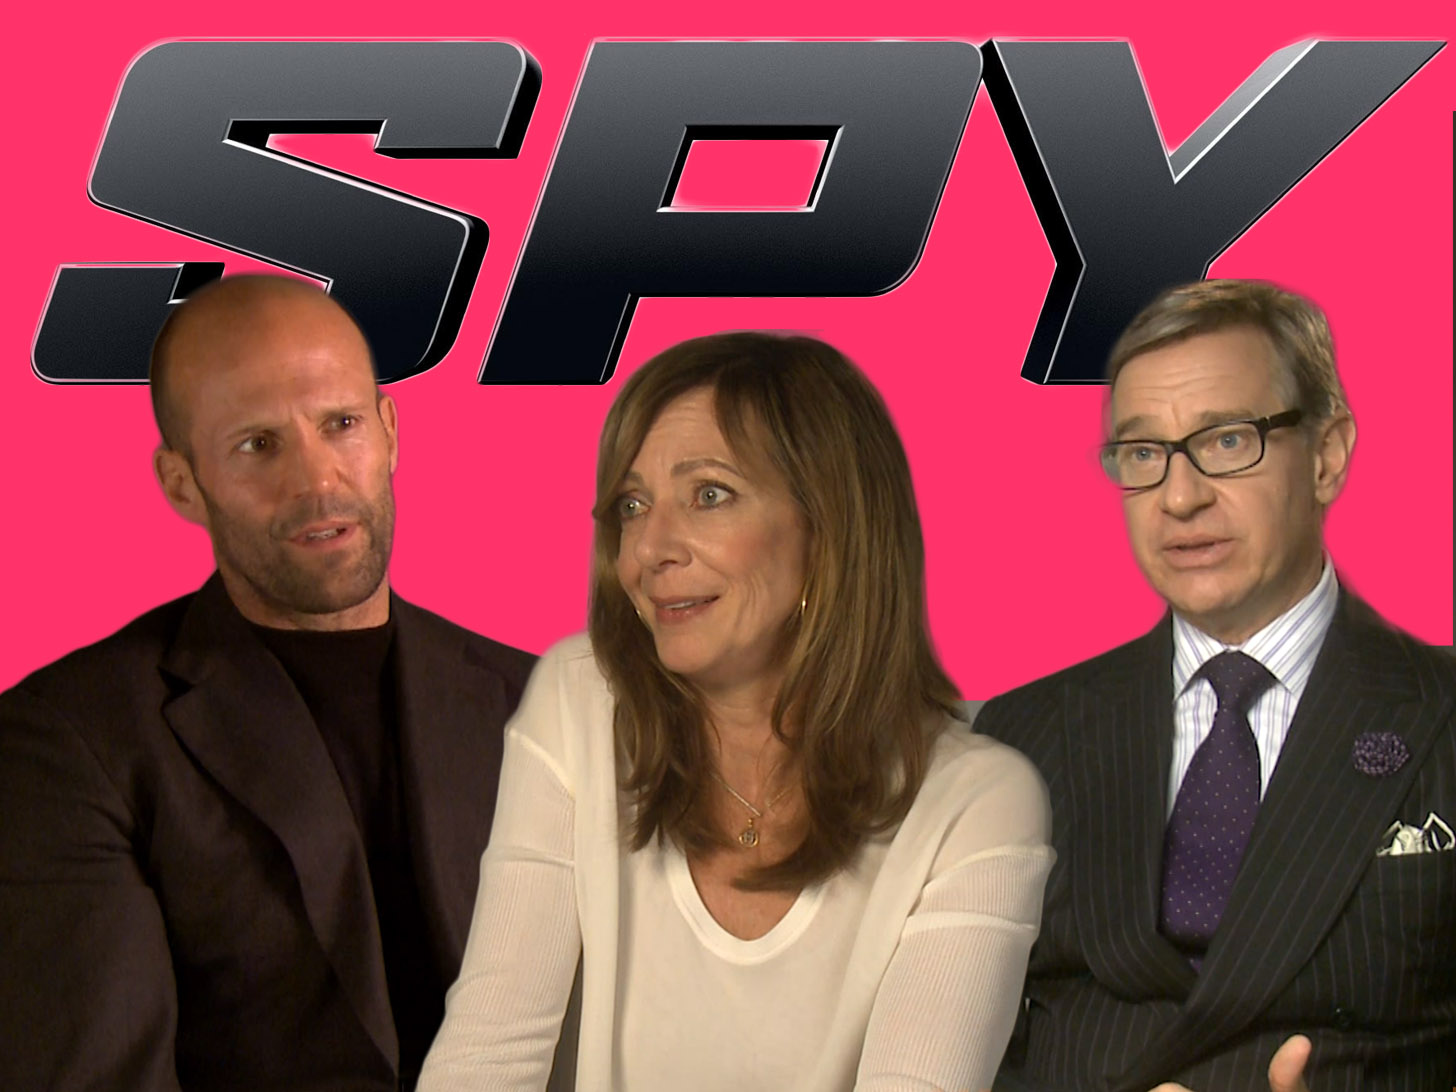 EXCLUSIVE: Jason Statham, Allison Janney and Spy director Paul Feig big up Melissa McCarthy